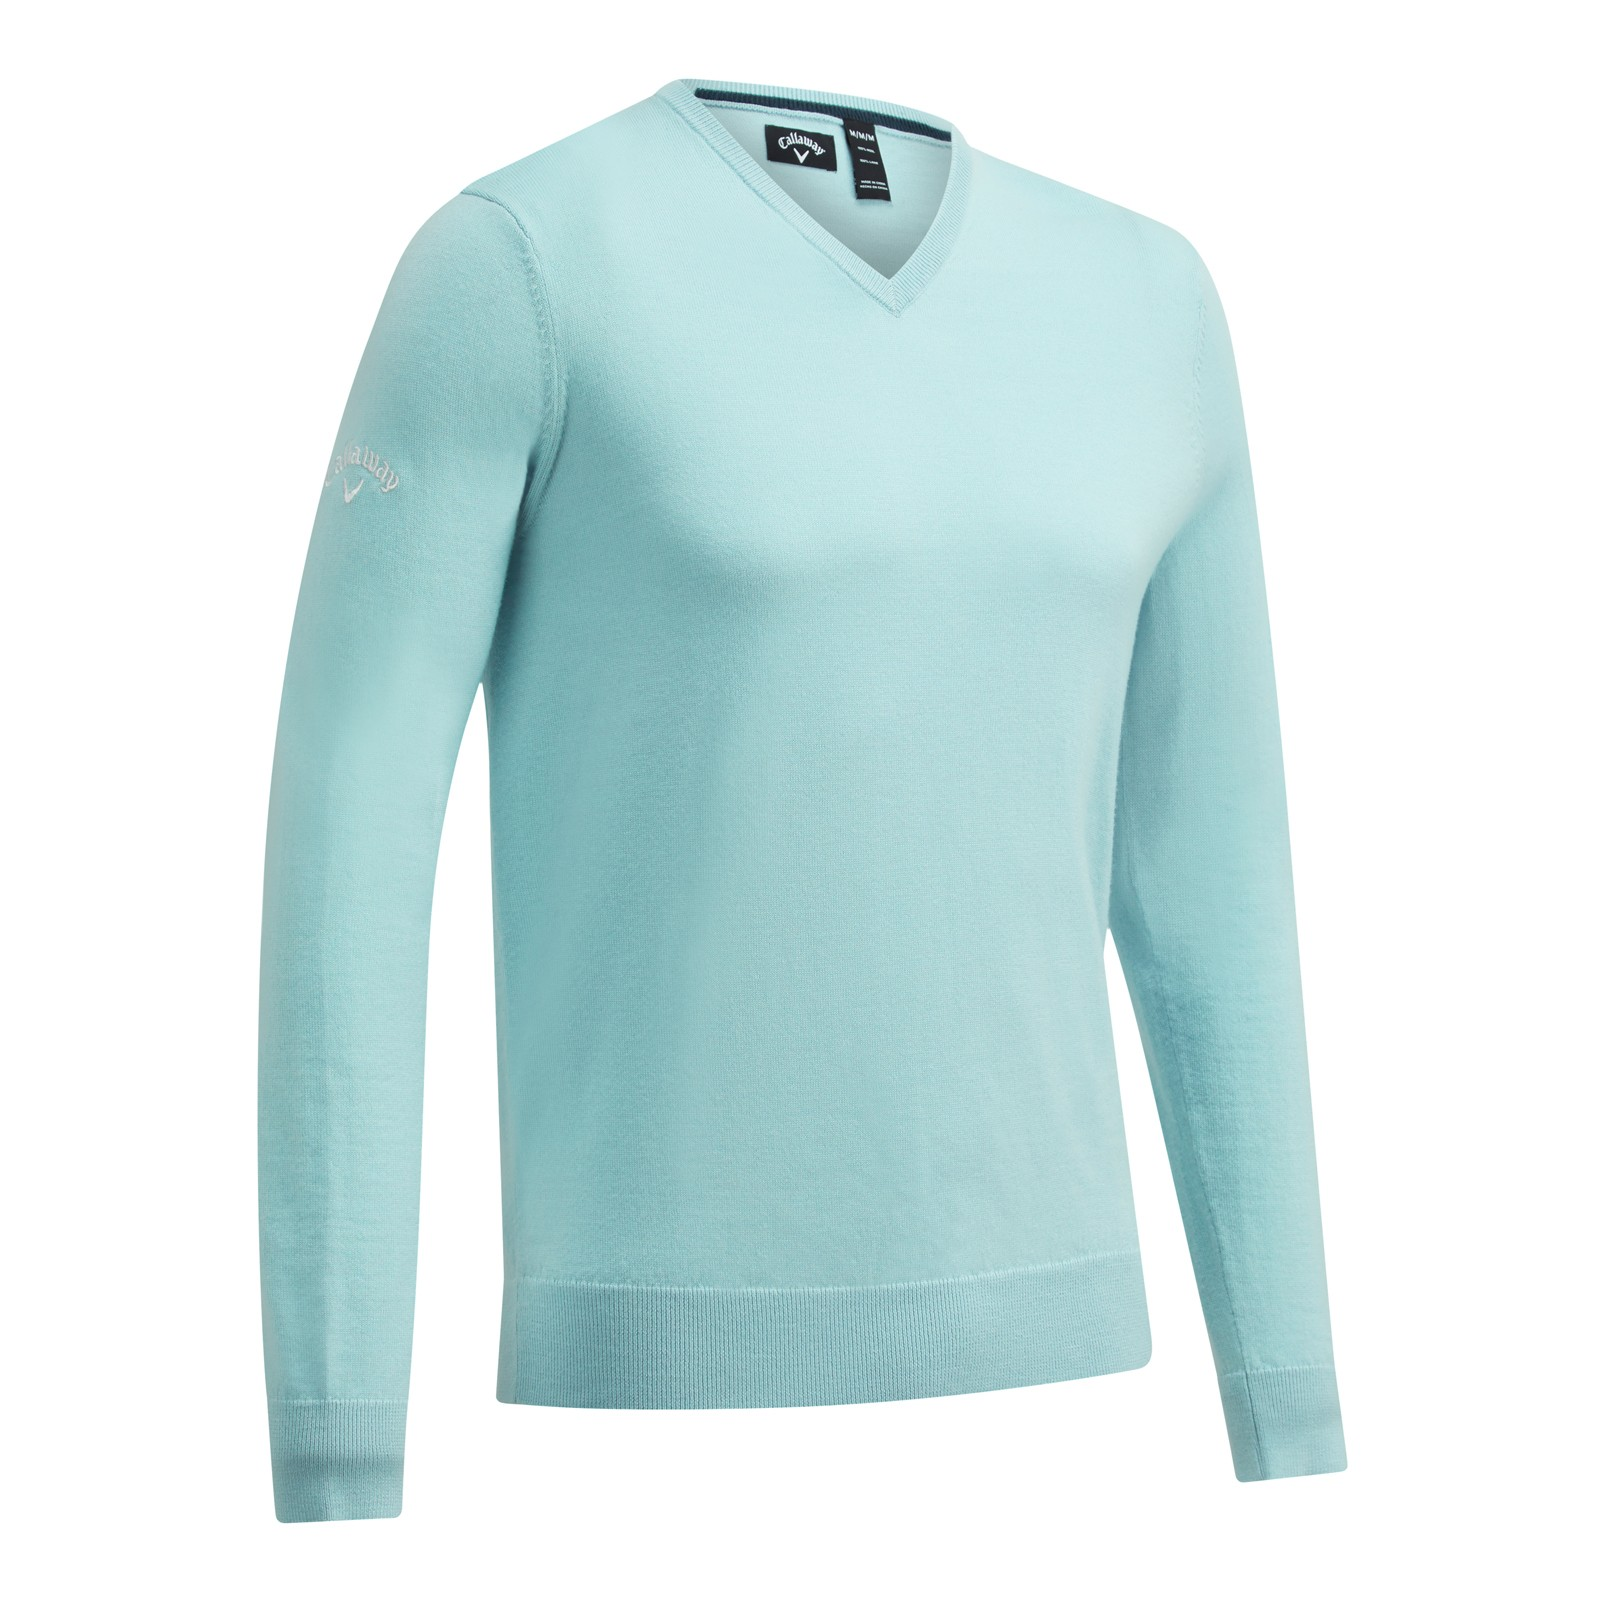 Callaway V-Neck Merino Sweaters